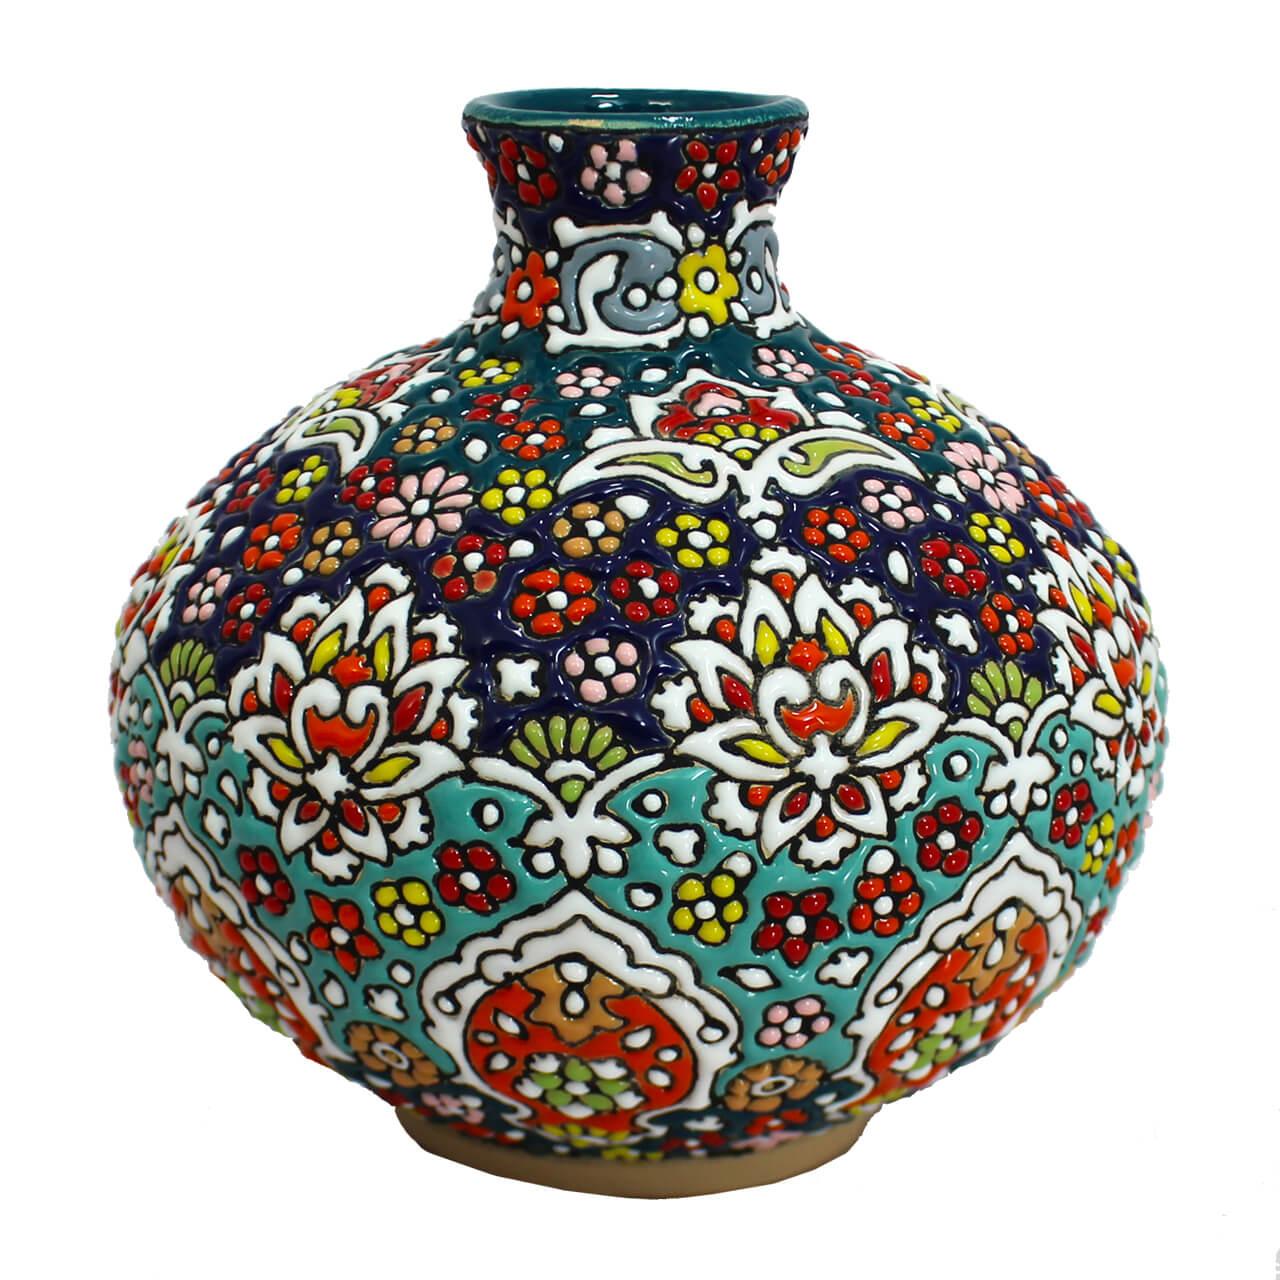 Minakari, the best souvenir from Iran